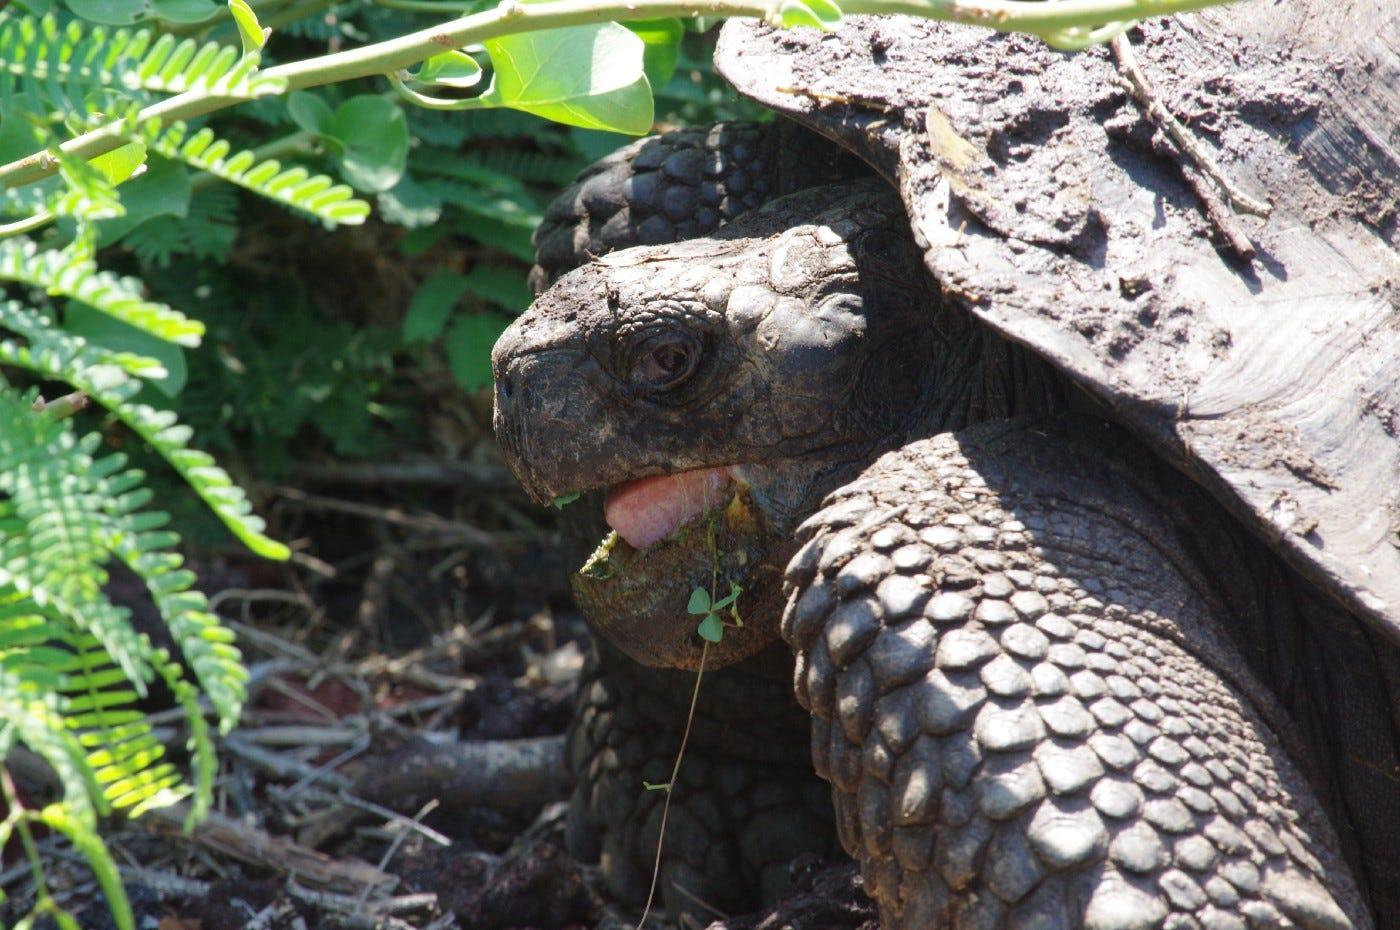 Land tortoise, Galápagos. Photo by Bret, 3-30-16